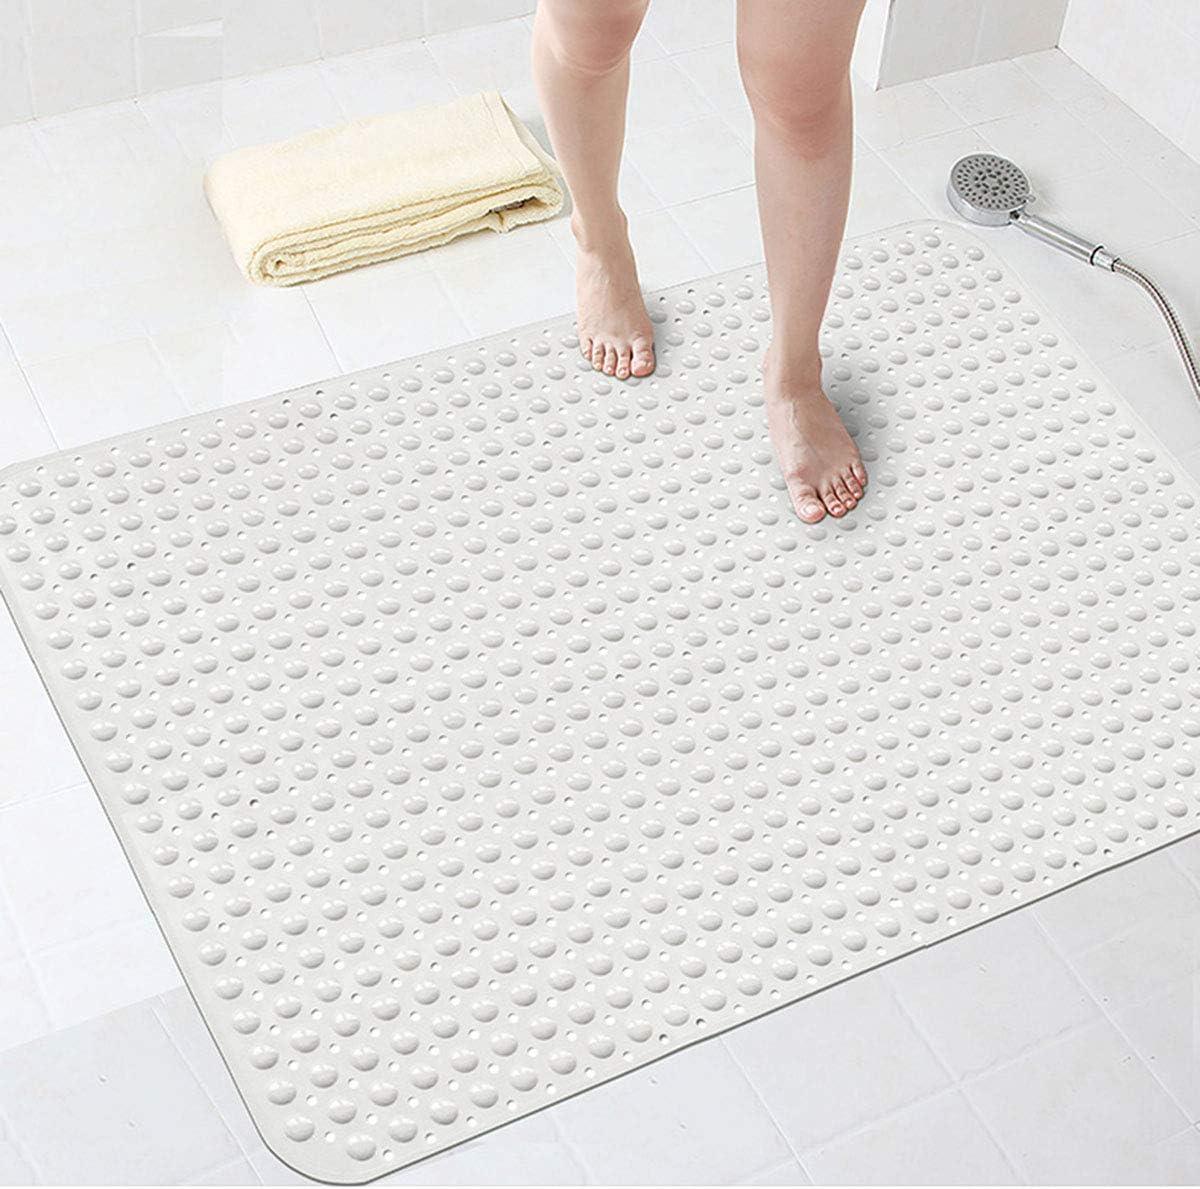 Bathsafe Extra Wide 88x58cm Non Slip Soft Bath Mat Anti Slip Tpr